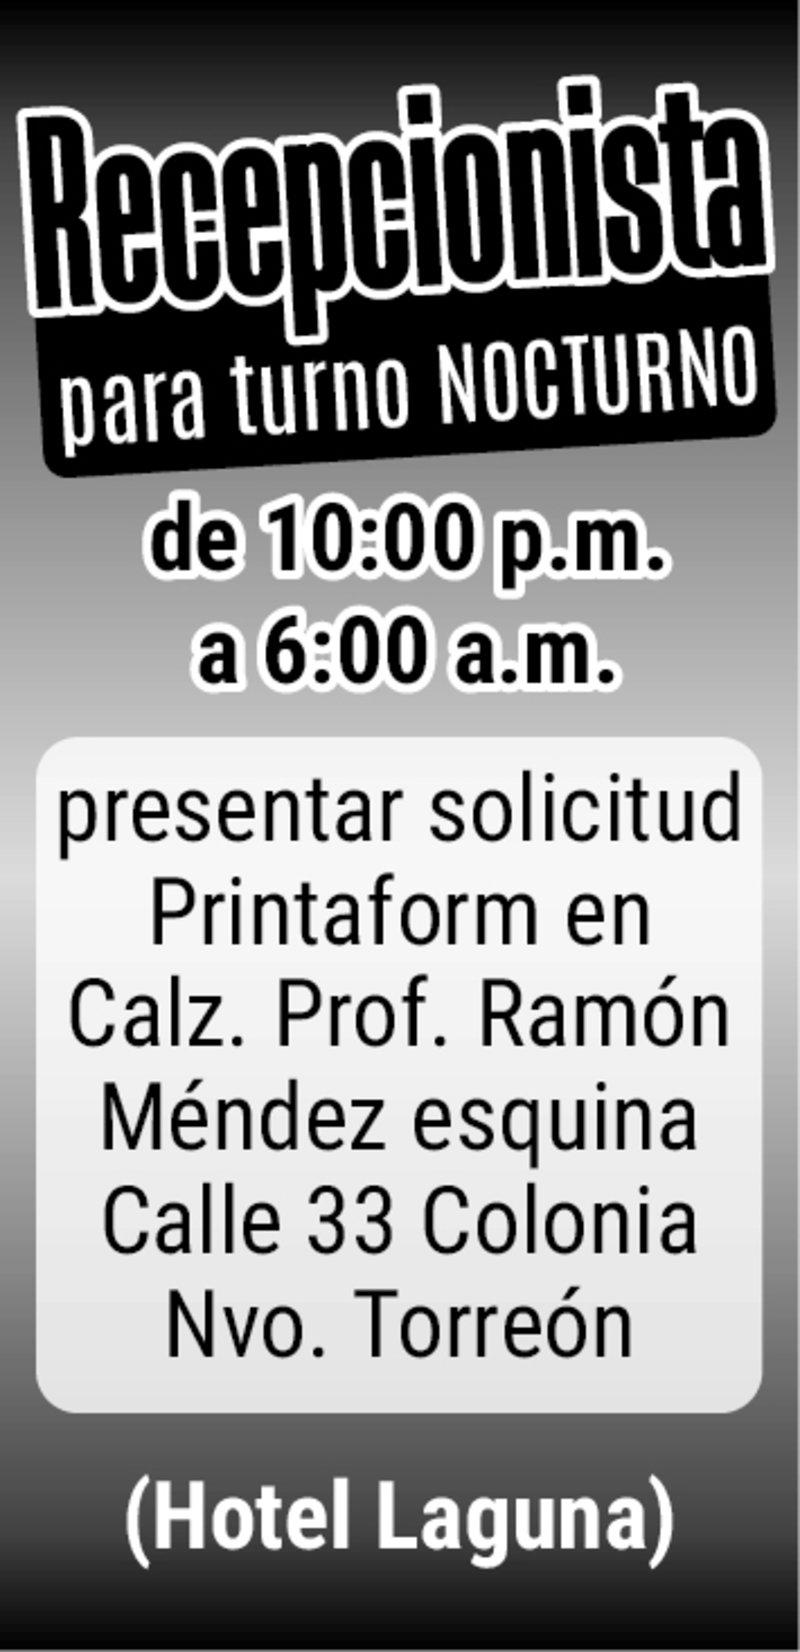 RECEPCIONISTA para turno NOCTURNO de 10:00 p.m. a 6:00 a.m. presentar solicitud Printaform en Calz. Prof. Ramón Méndez esquina Calle 33 Colonia Nvo. Torreón (Hotel Laguna)